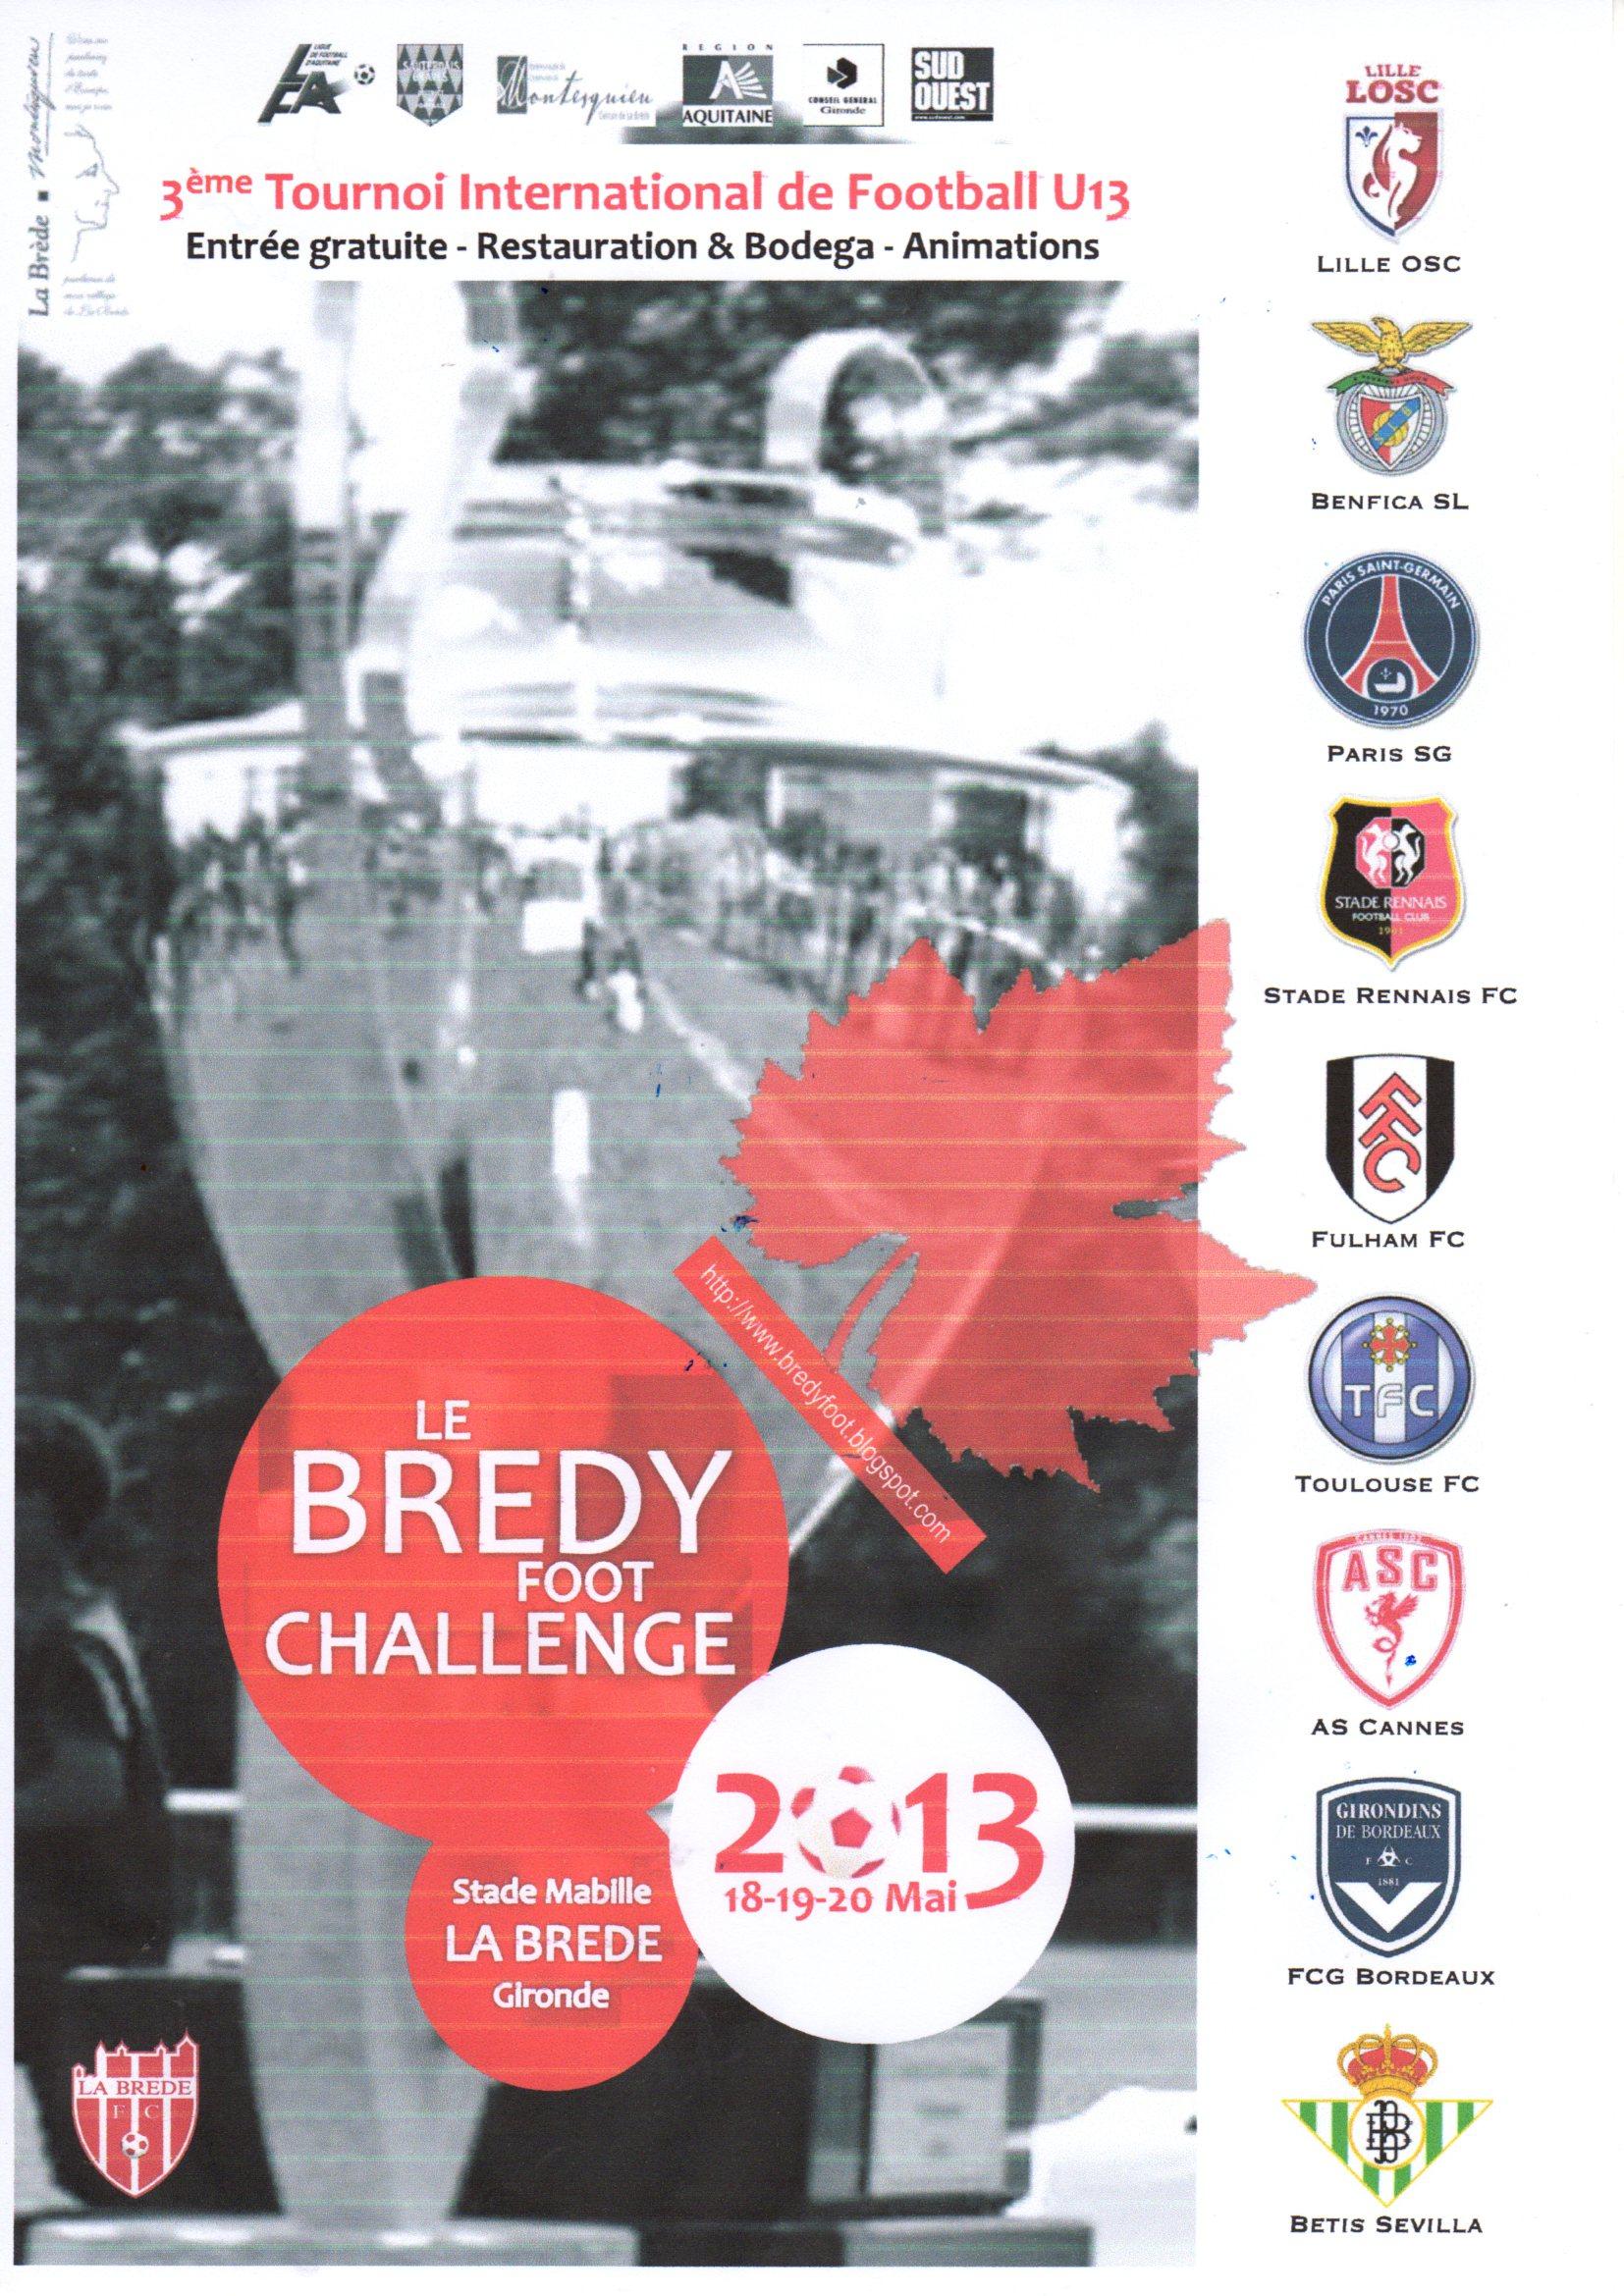 Cfa Girondins : Bilan du tournoi U13 de la Brède - Formation Girondins